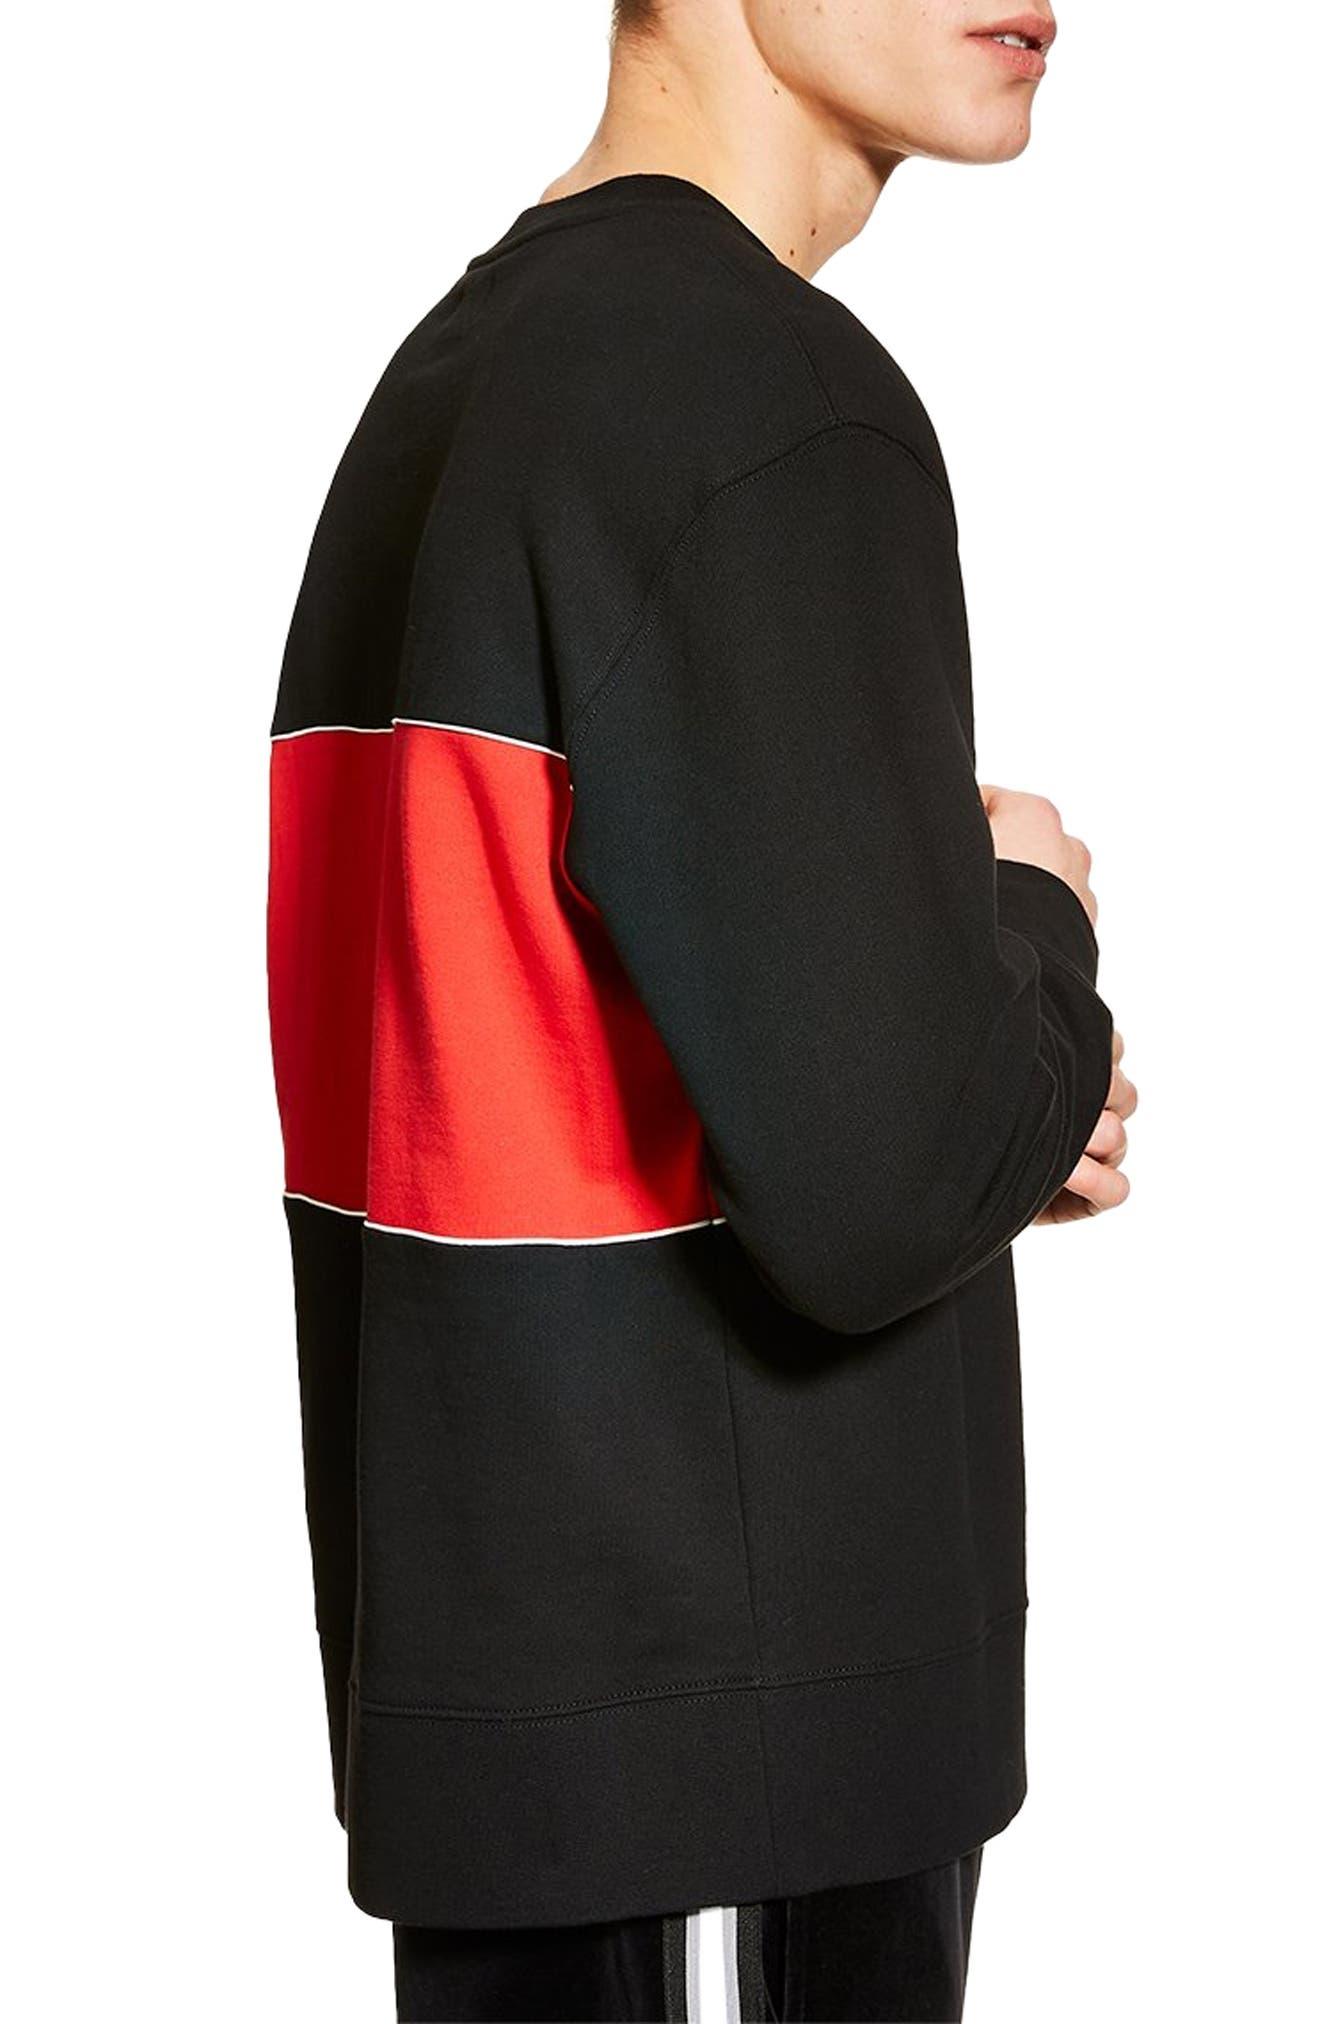 TOPMAN, Colorblock Longline Crewneck Sweatshirt, Alternate thumbnail 3, color, BLACK